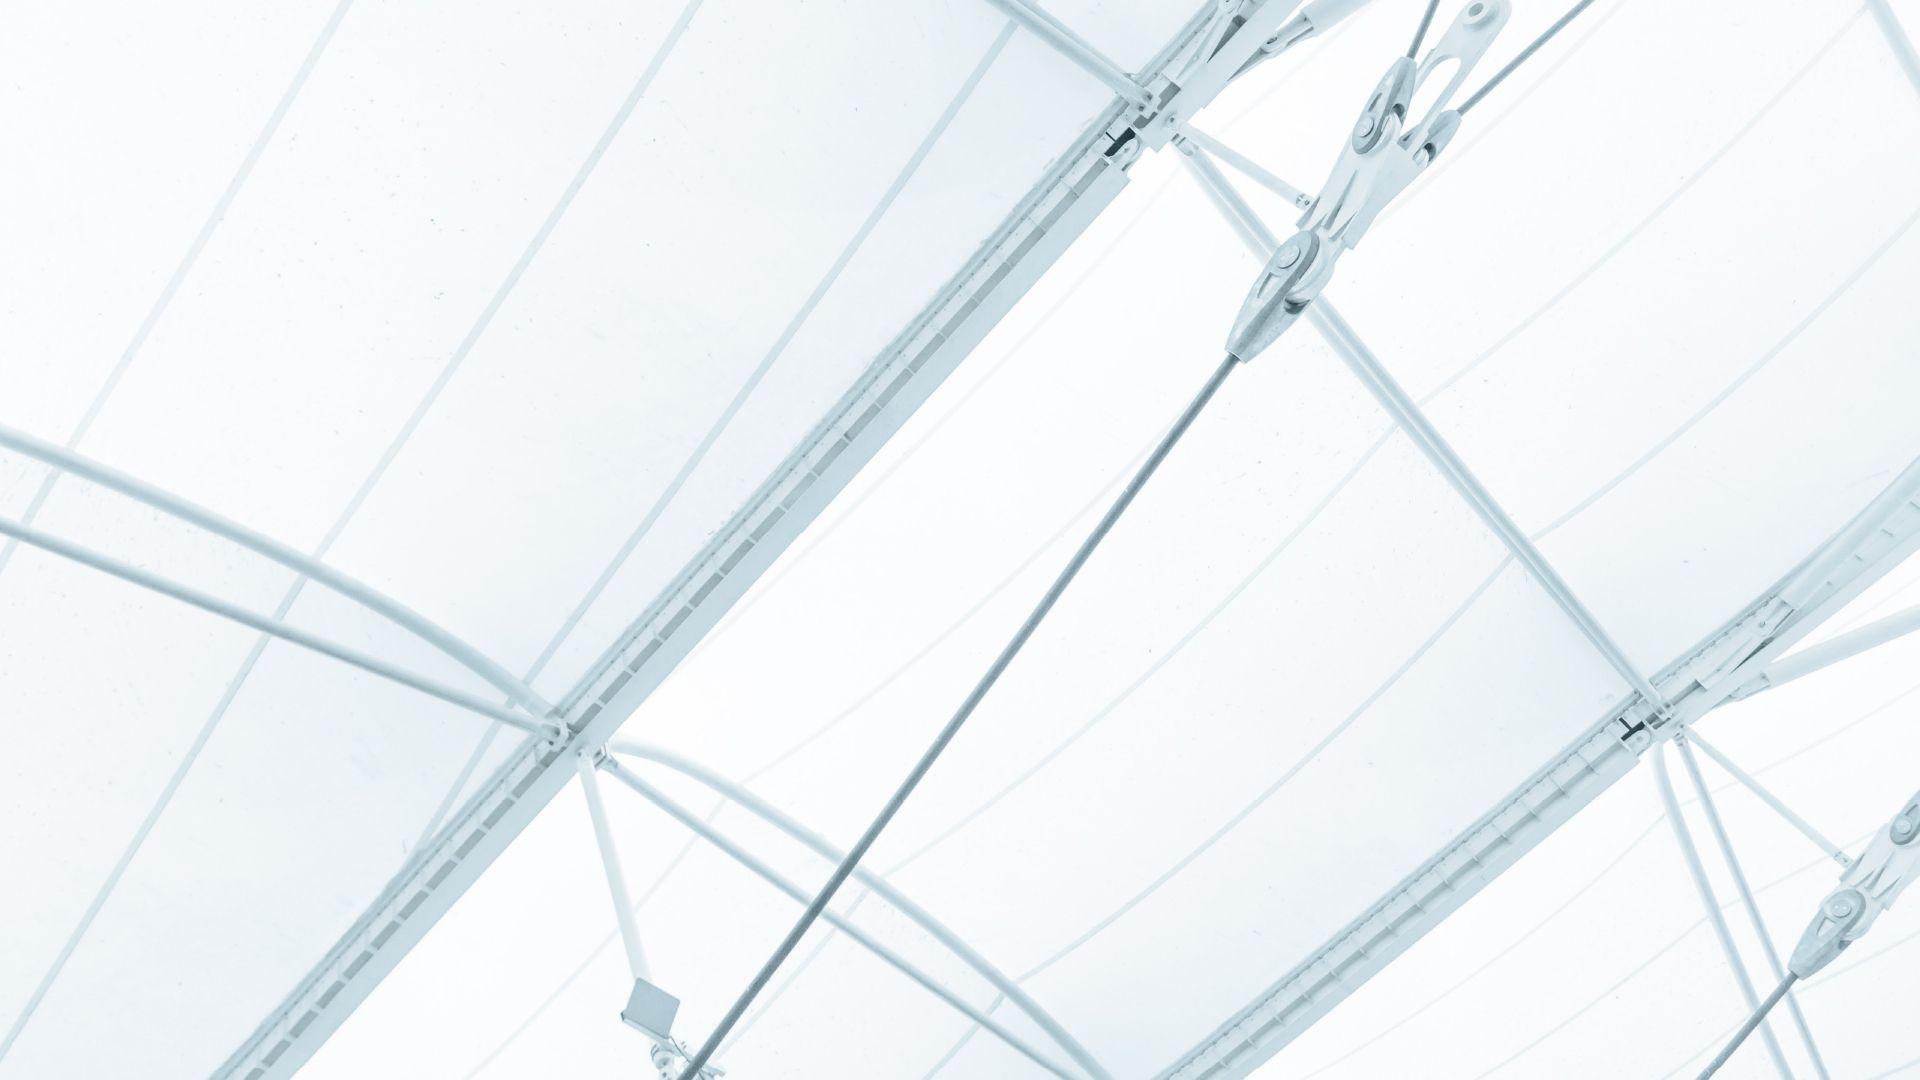 Lagerzelt mit Stahl-Aluminiumgerüst